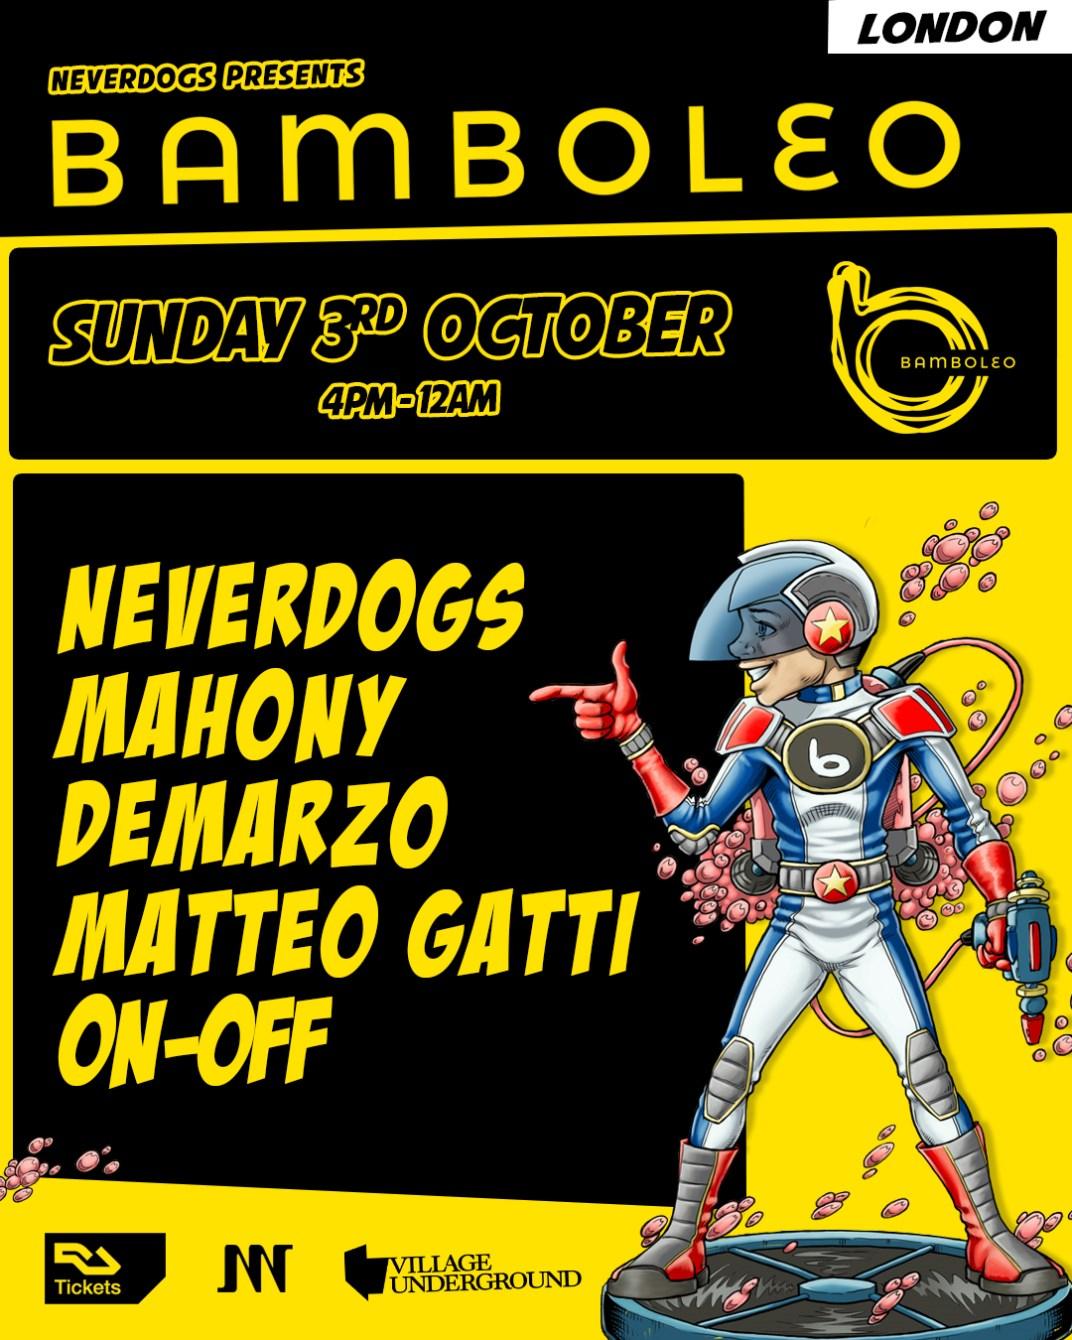 Neverdogs presents: Bamboleo London - Flyer back